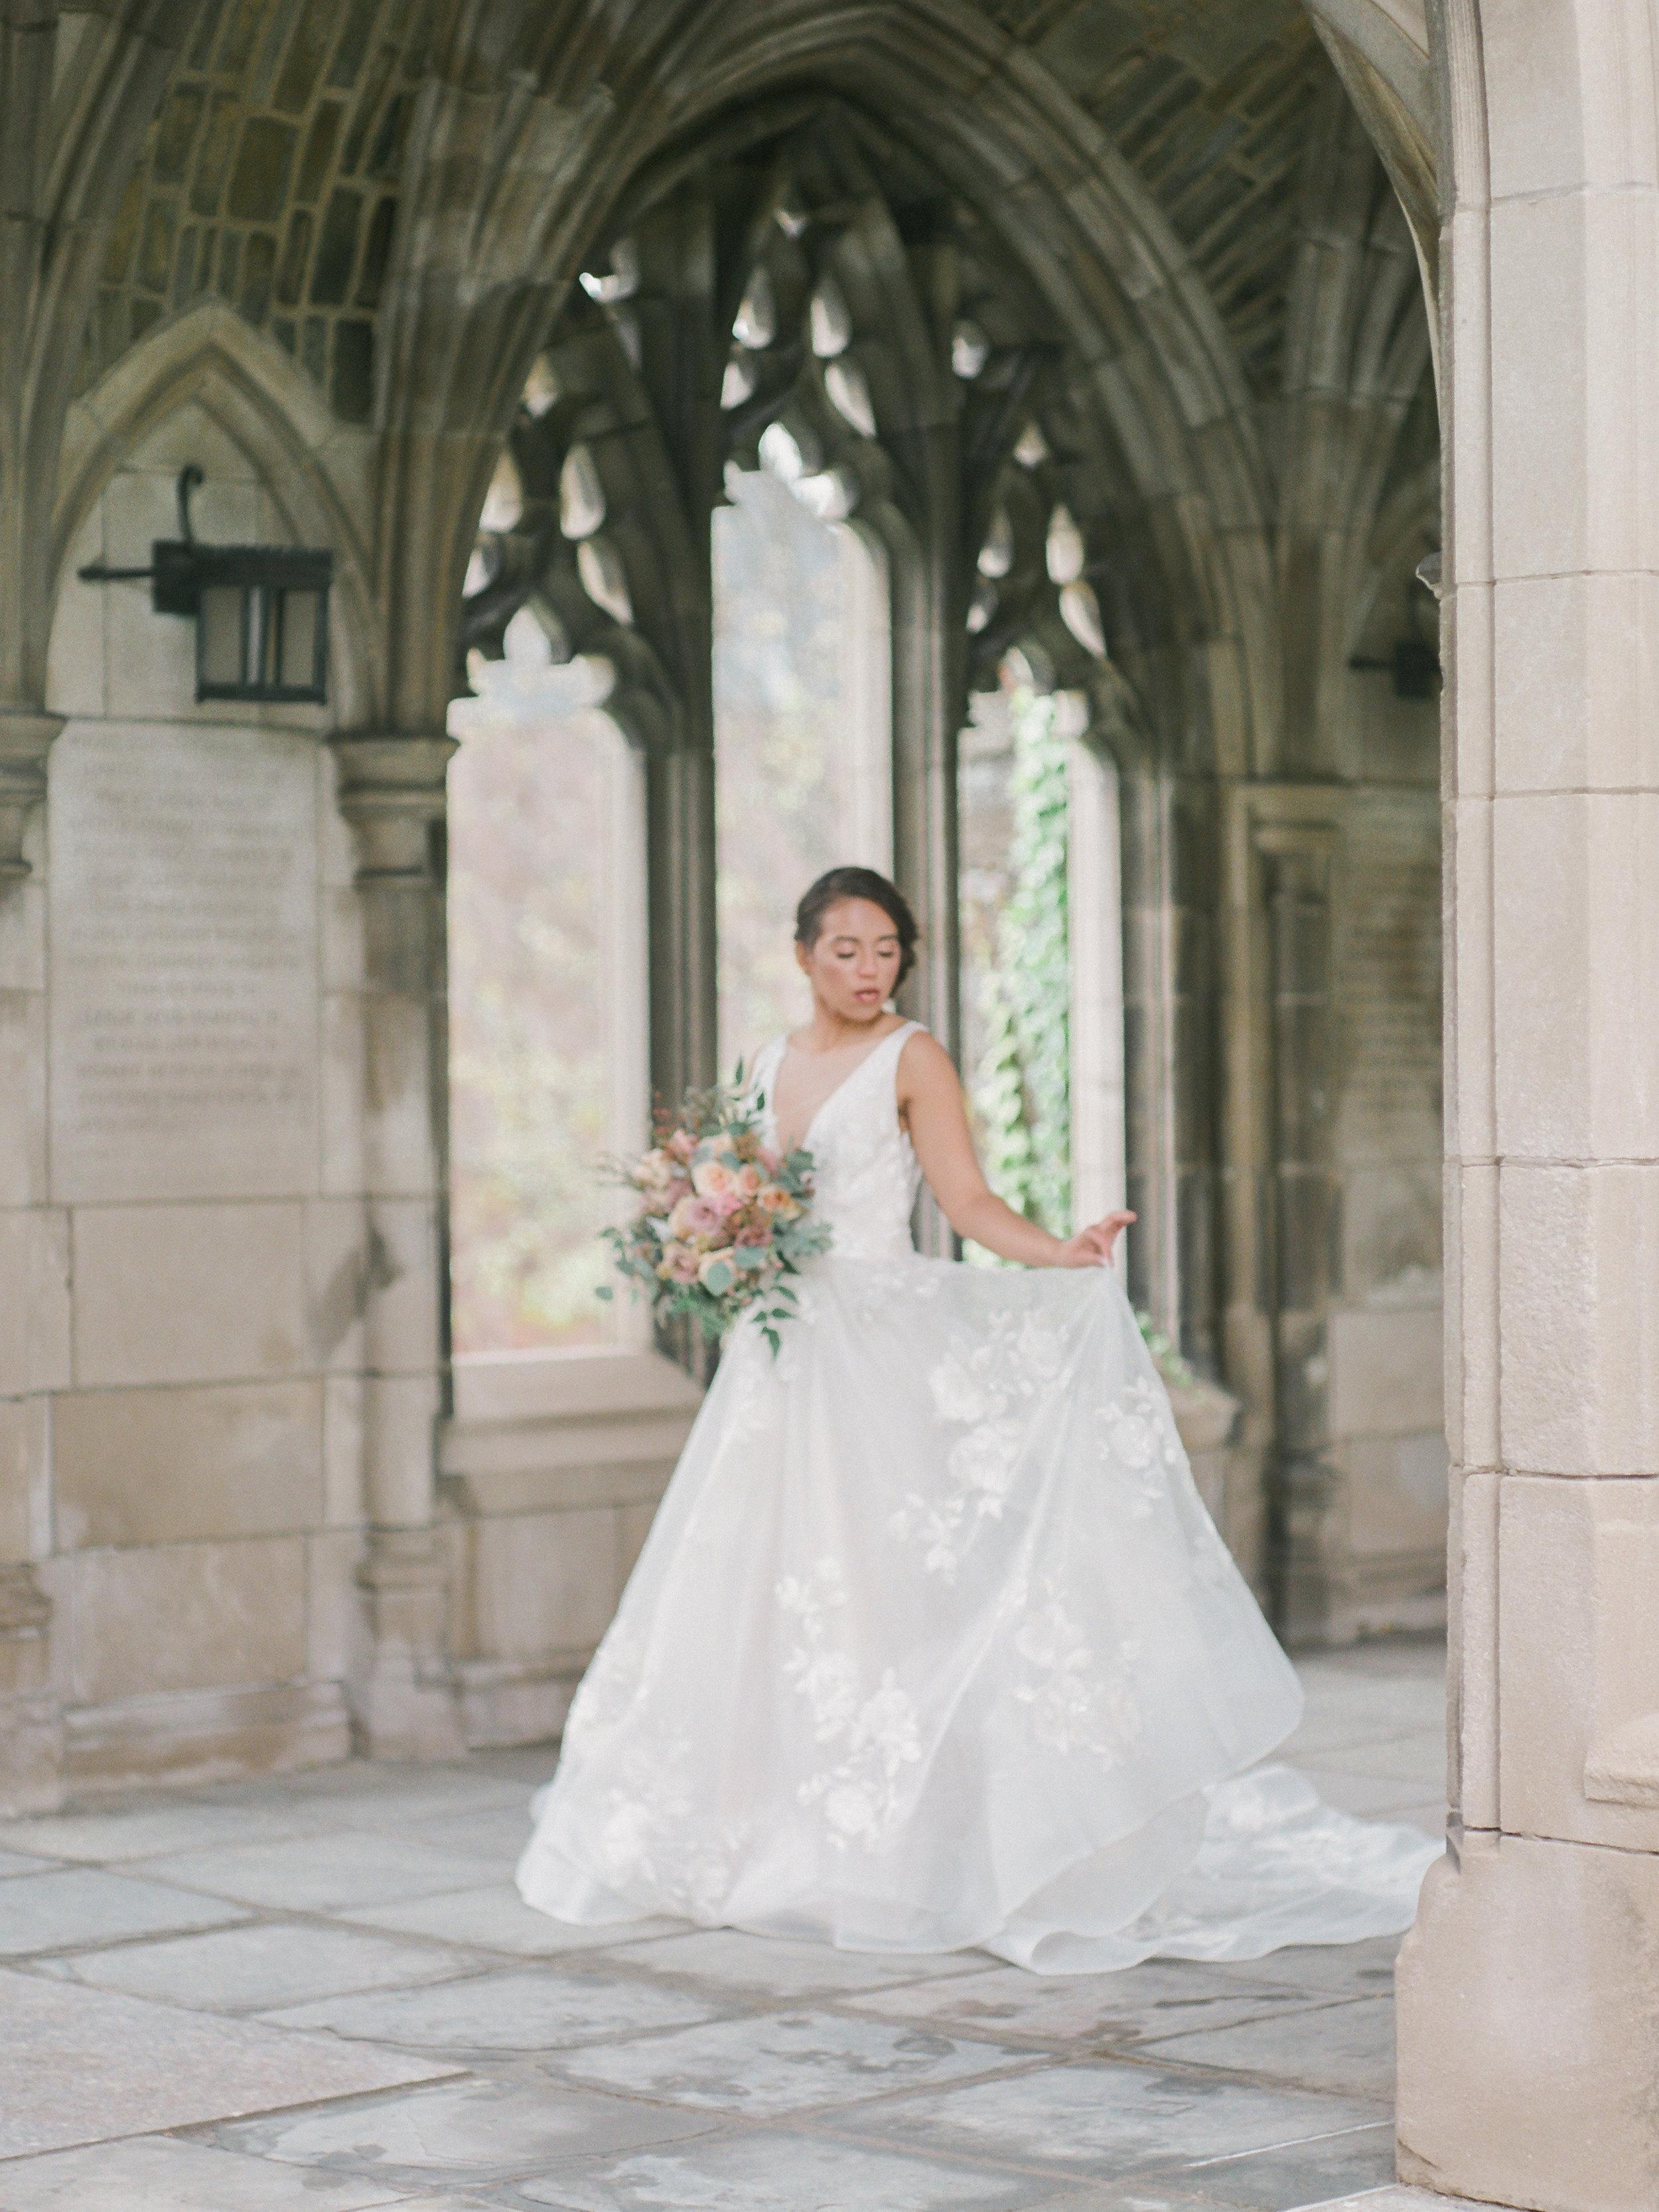 Ithaca New York-Brides Story-Manda Weaver-Wedding-9.jpg